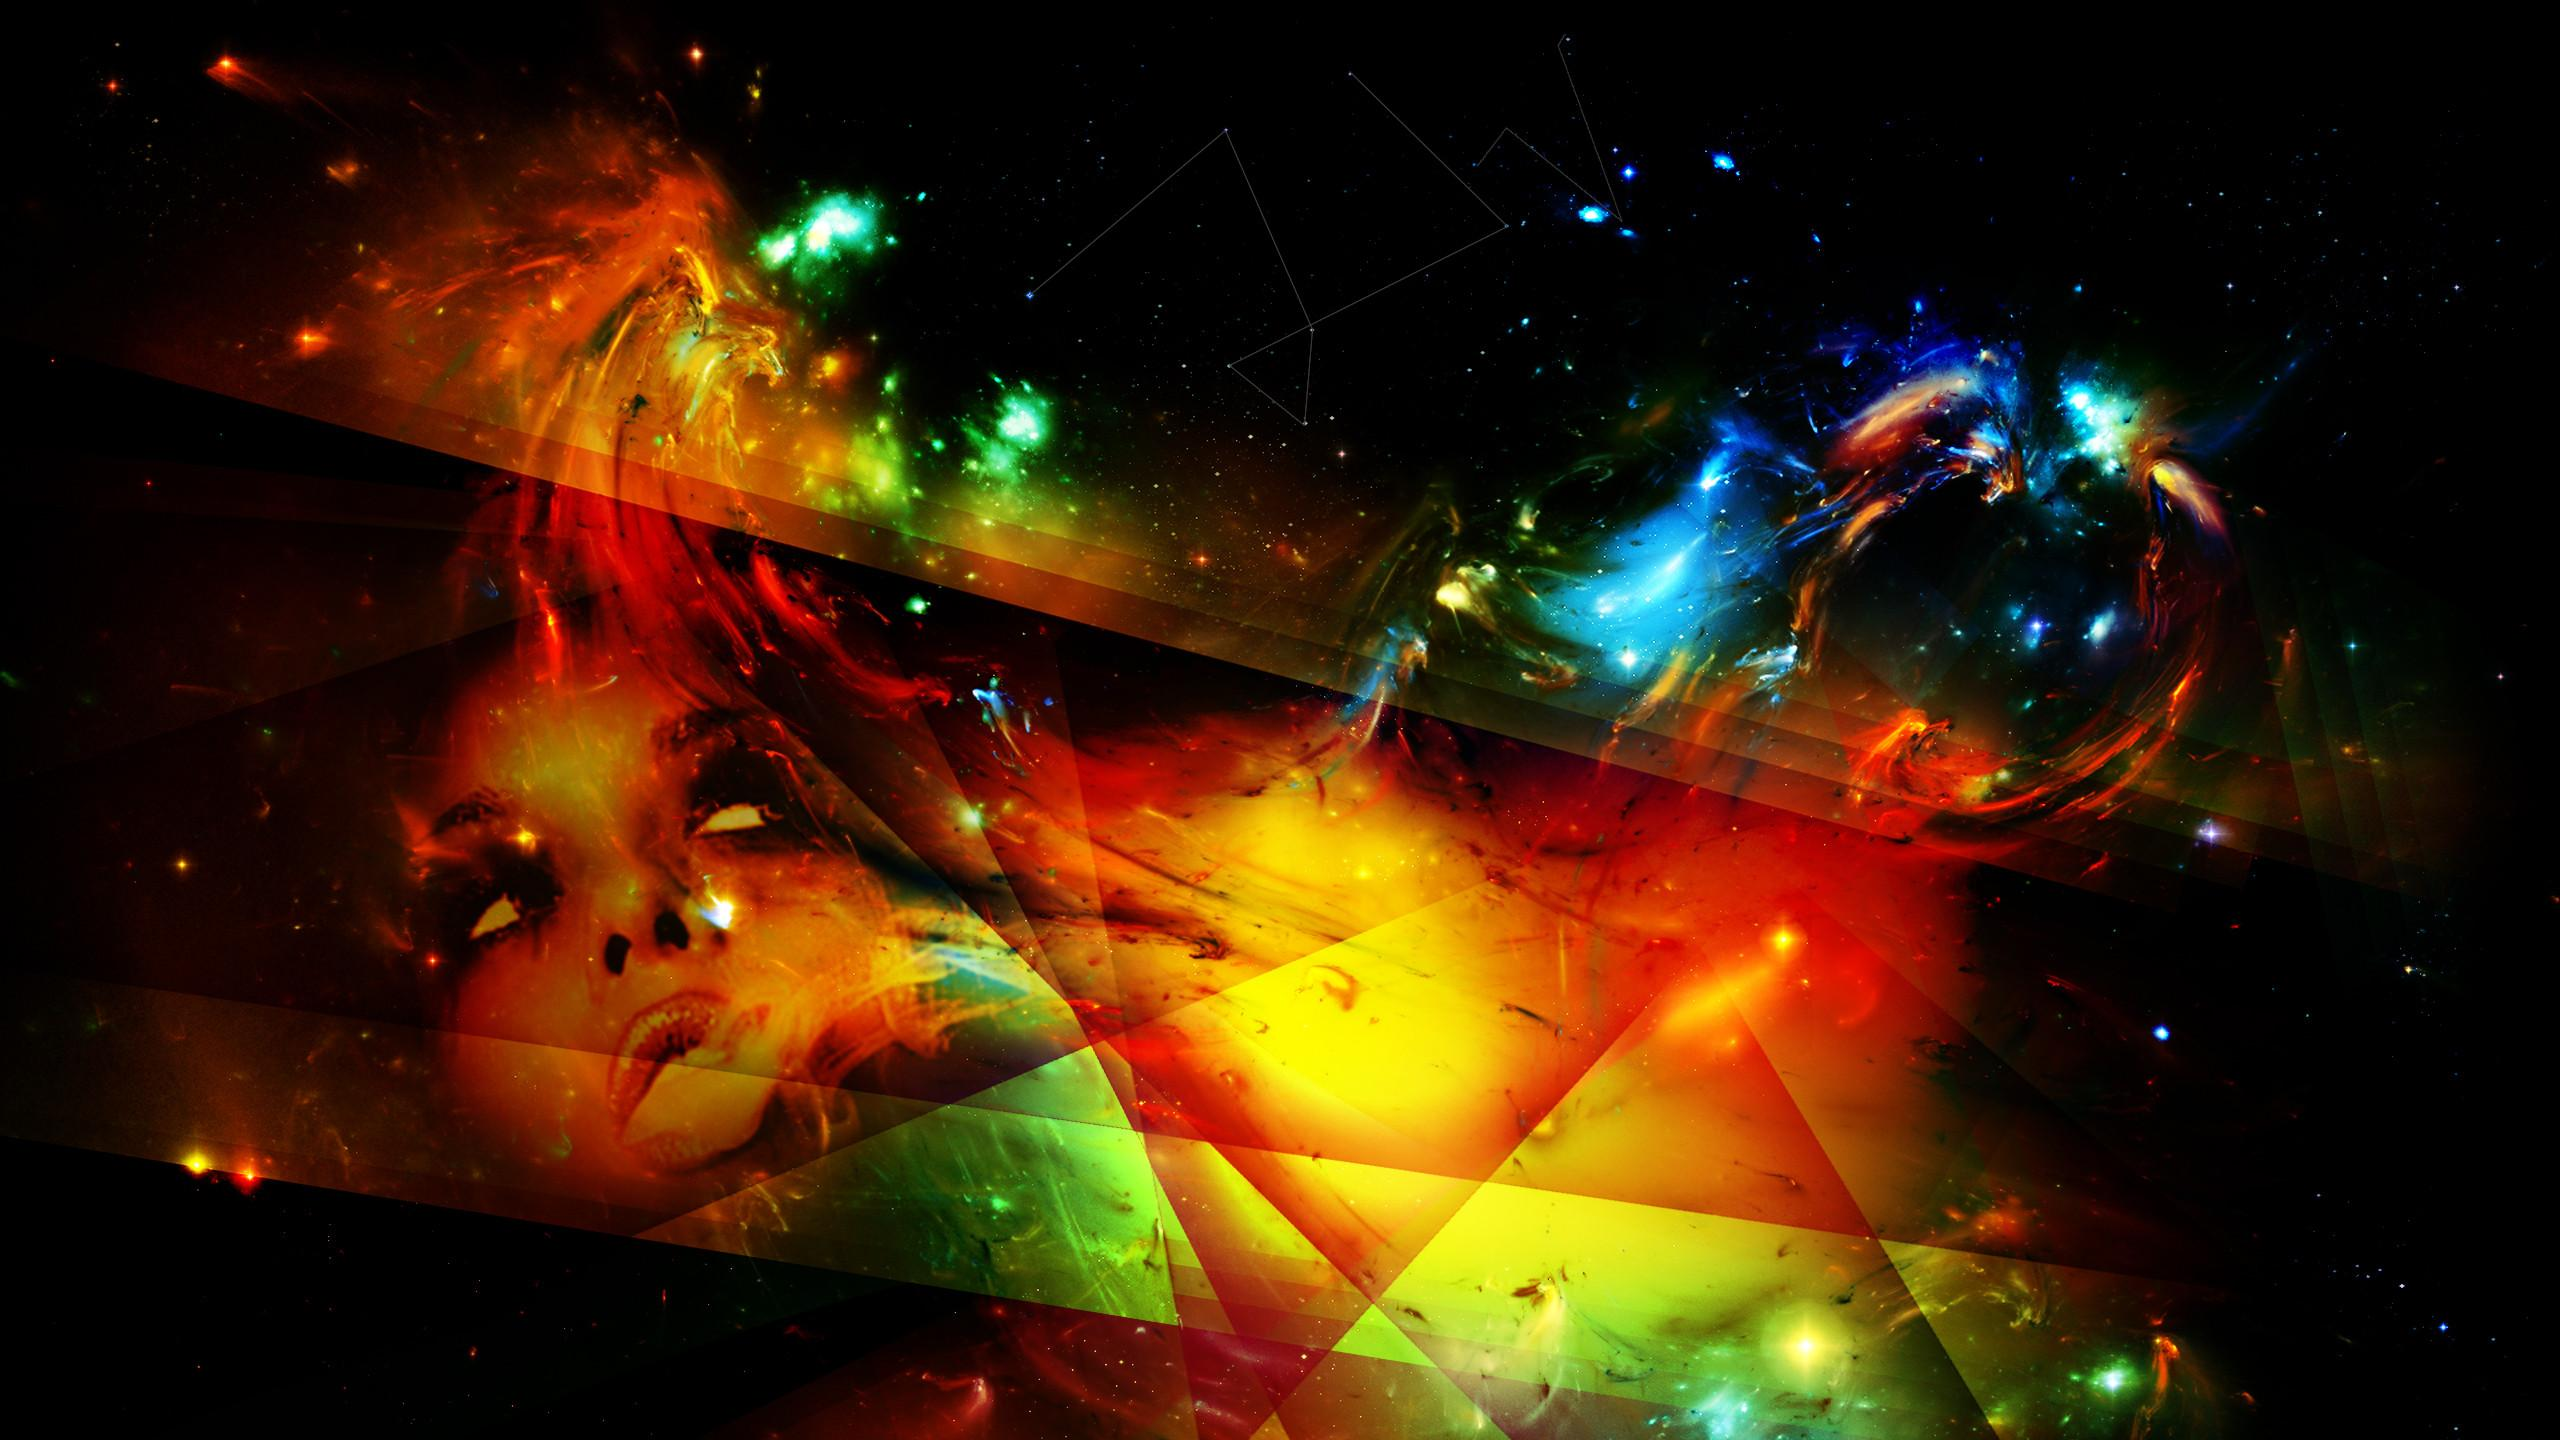 Hd Abstract Art Desktop Wallpaper Abstract Hd Wallpapers 70 3094838 Hd Wallpaper Backgrounds Download